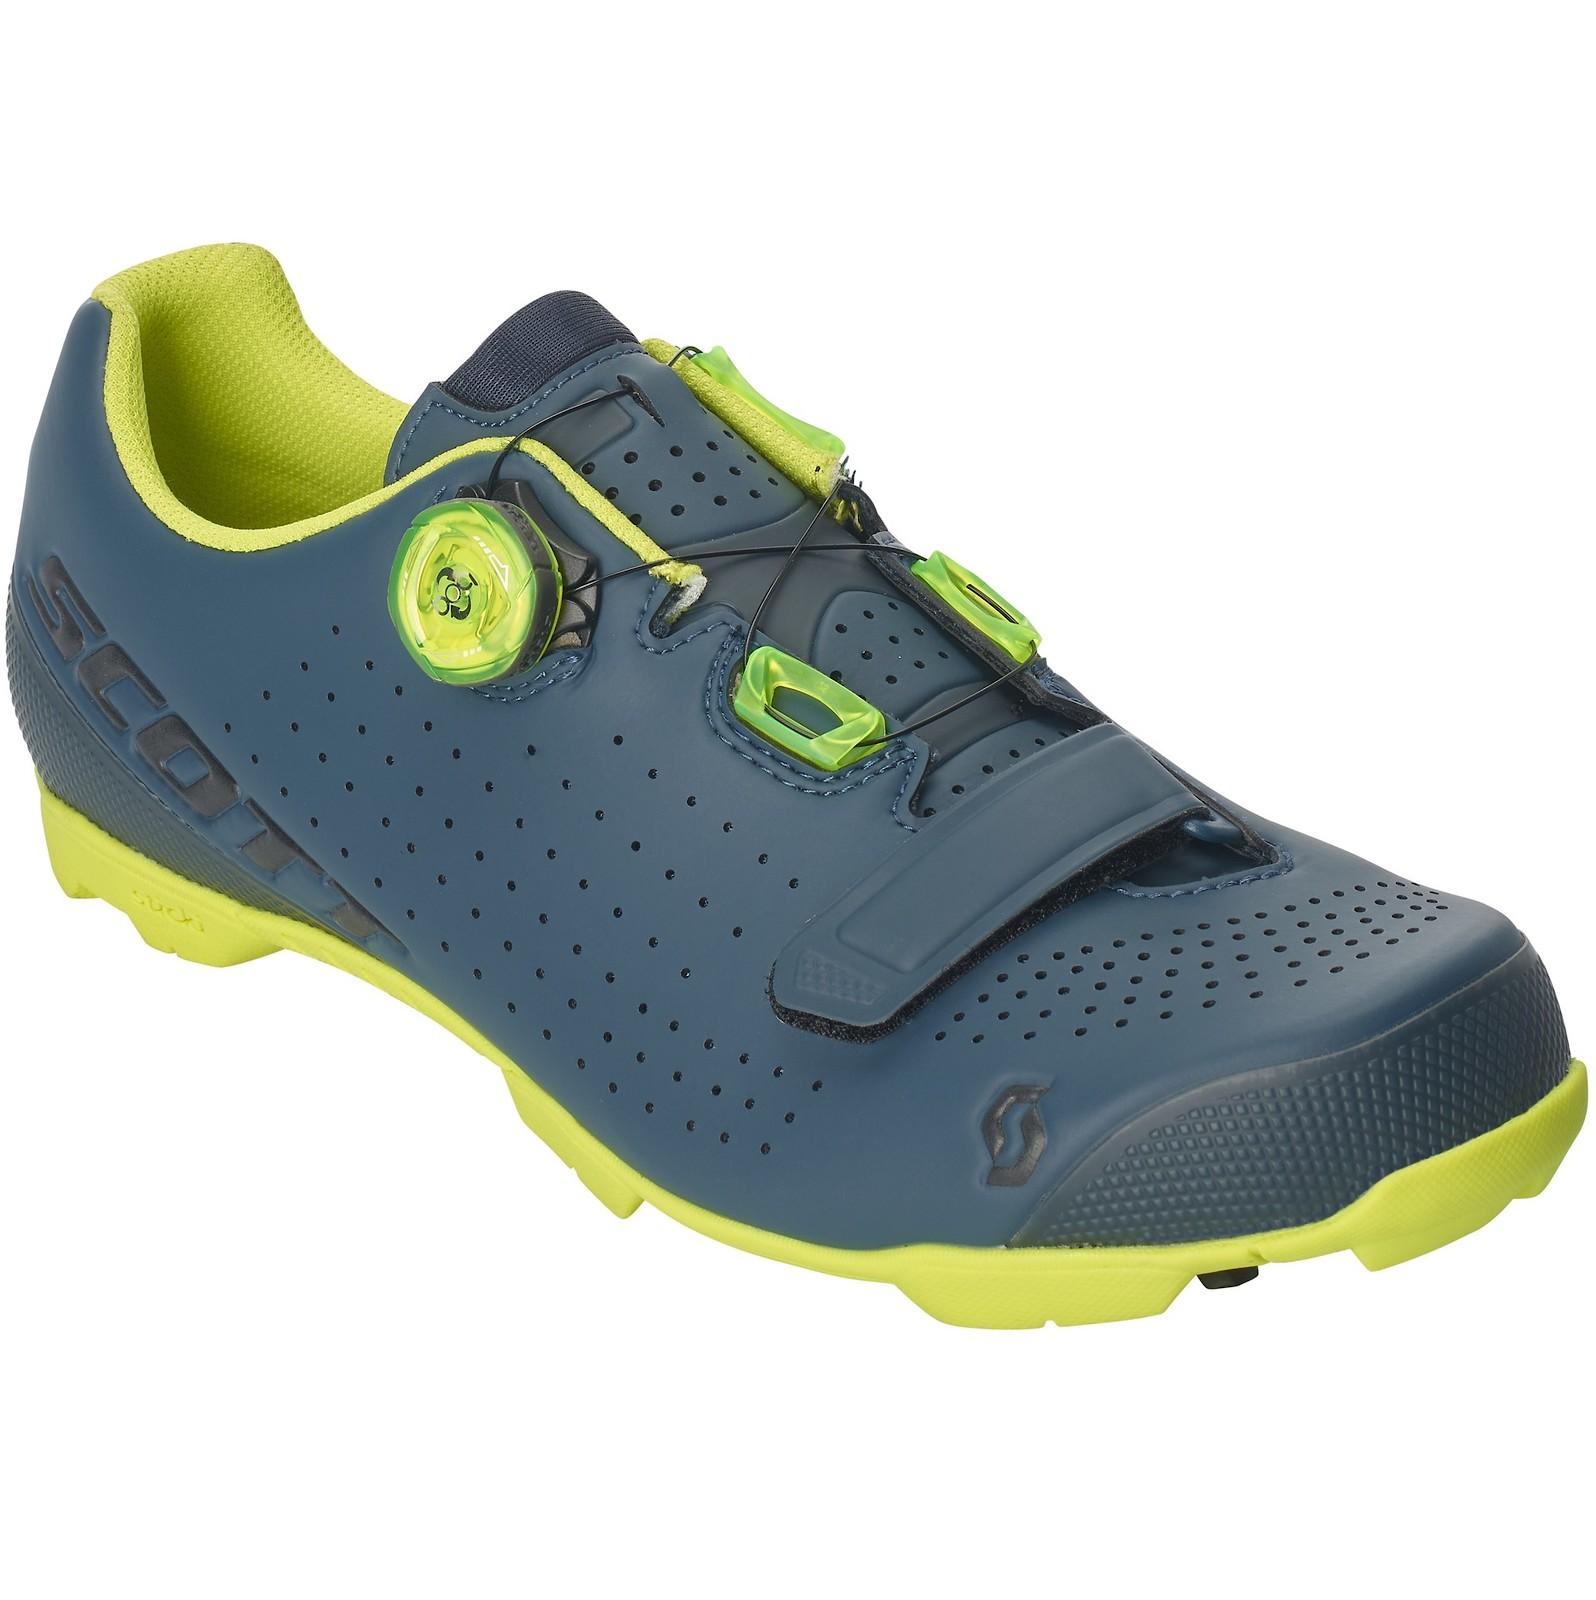 Scott Vertec Boa shoe in nightfall blue/neon yellow